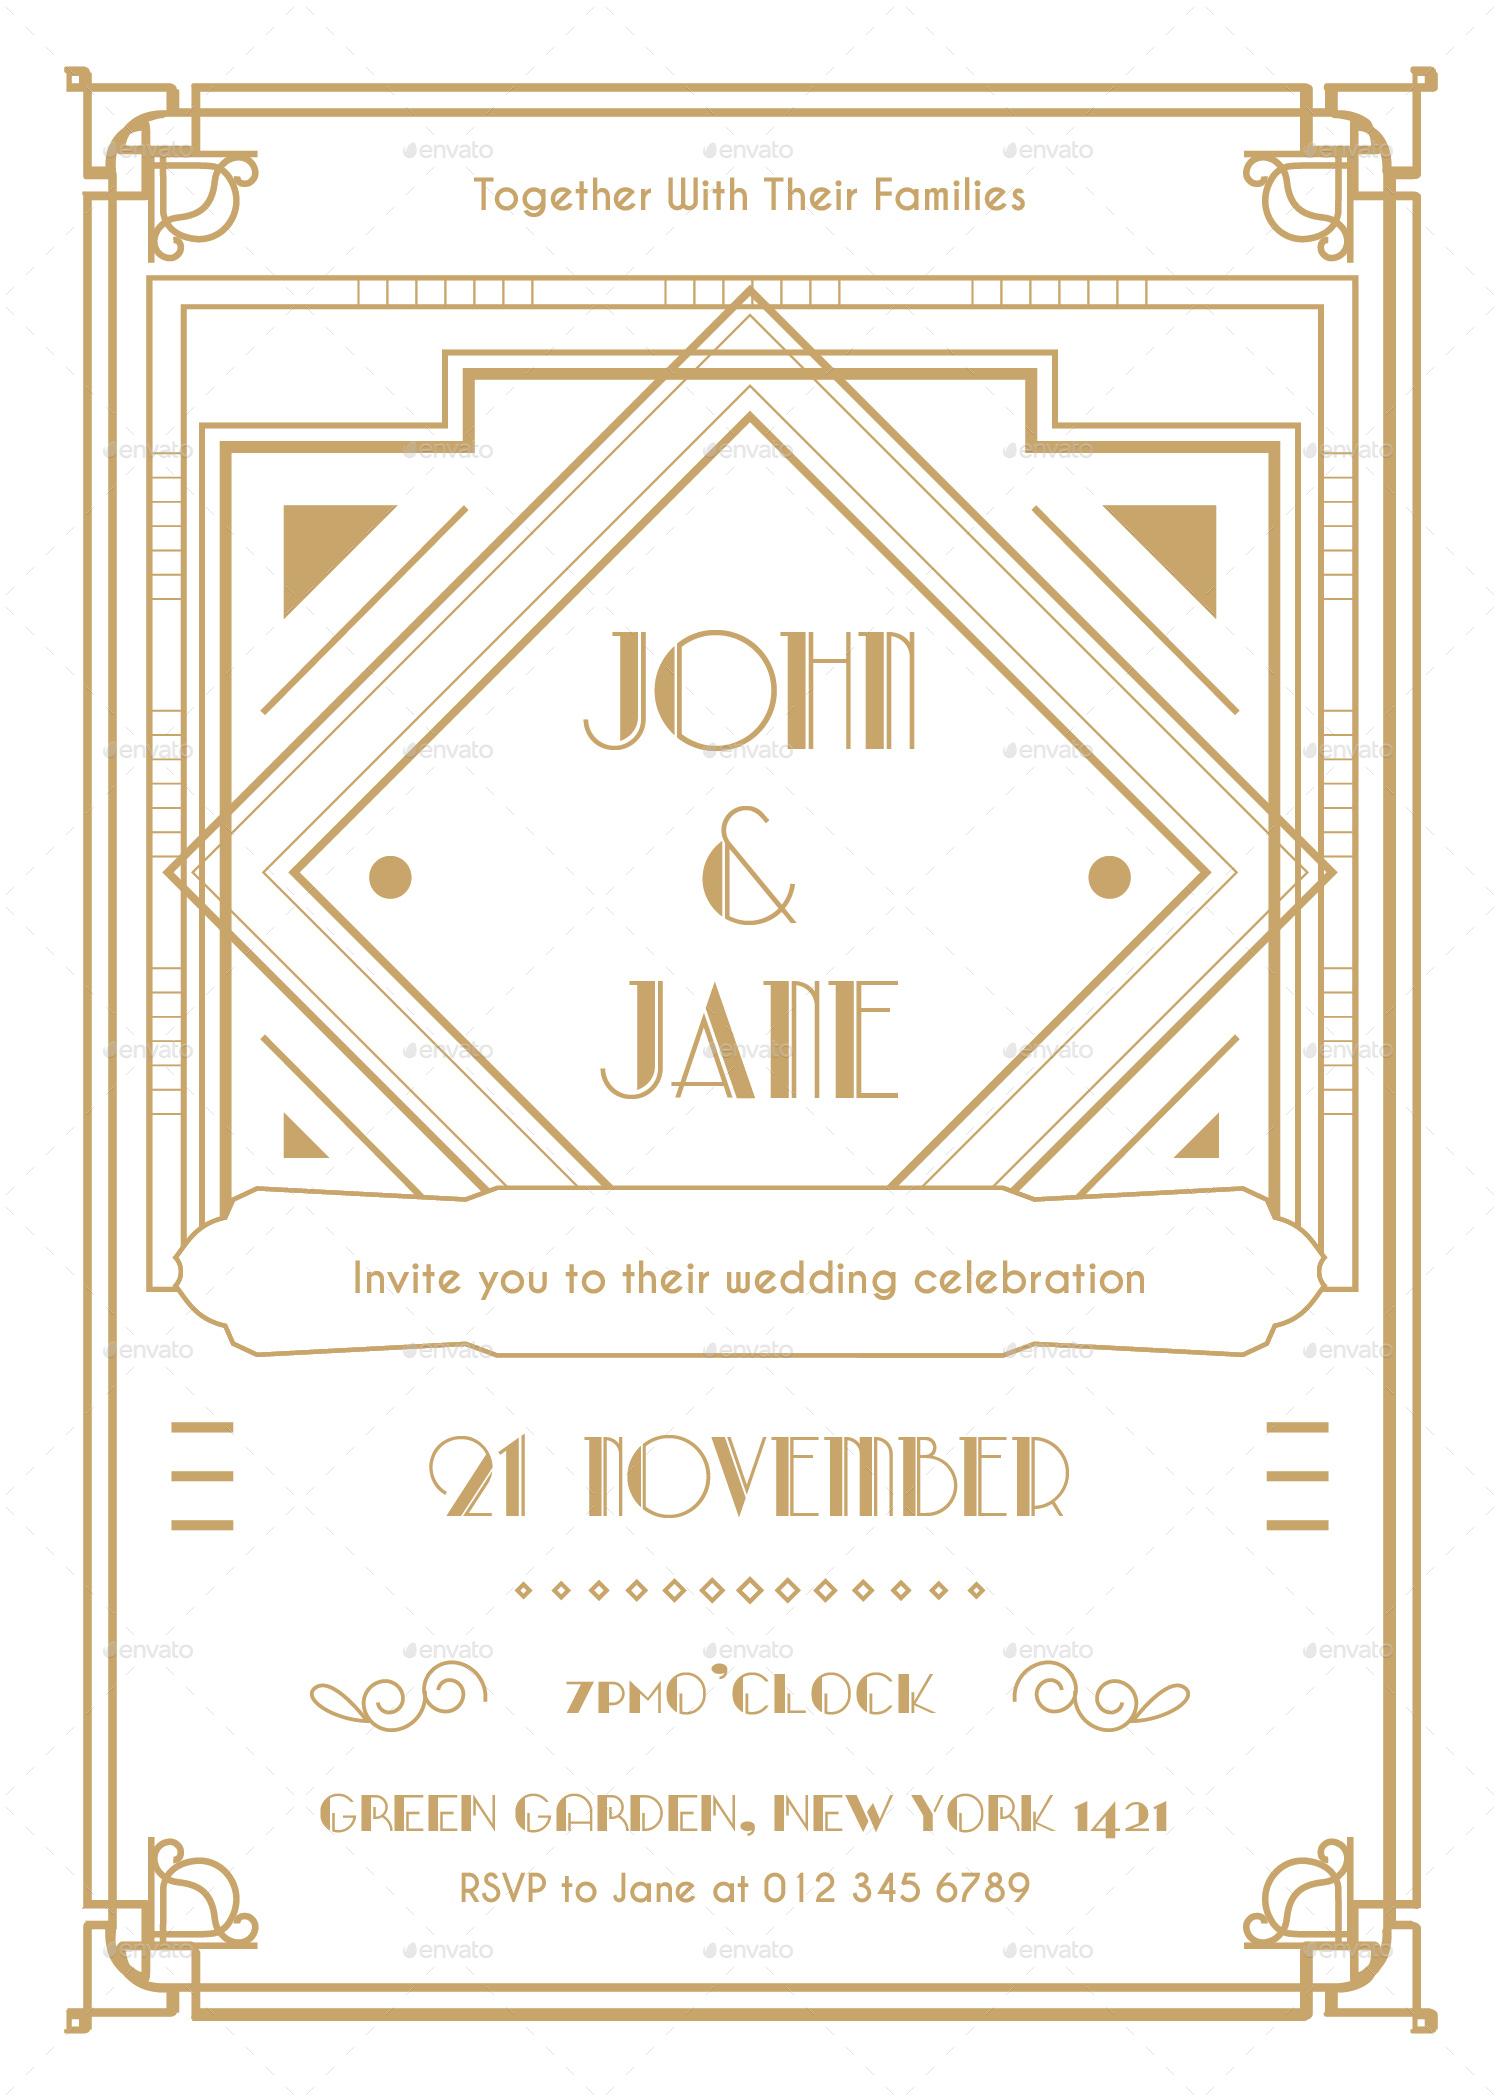 art deco wedding invitation by infinite78910 | graphicriver, Wedding invitations